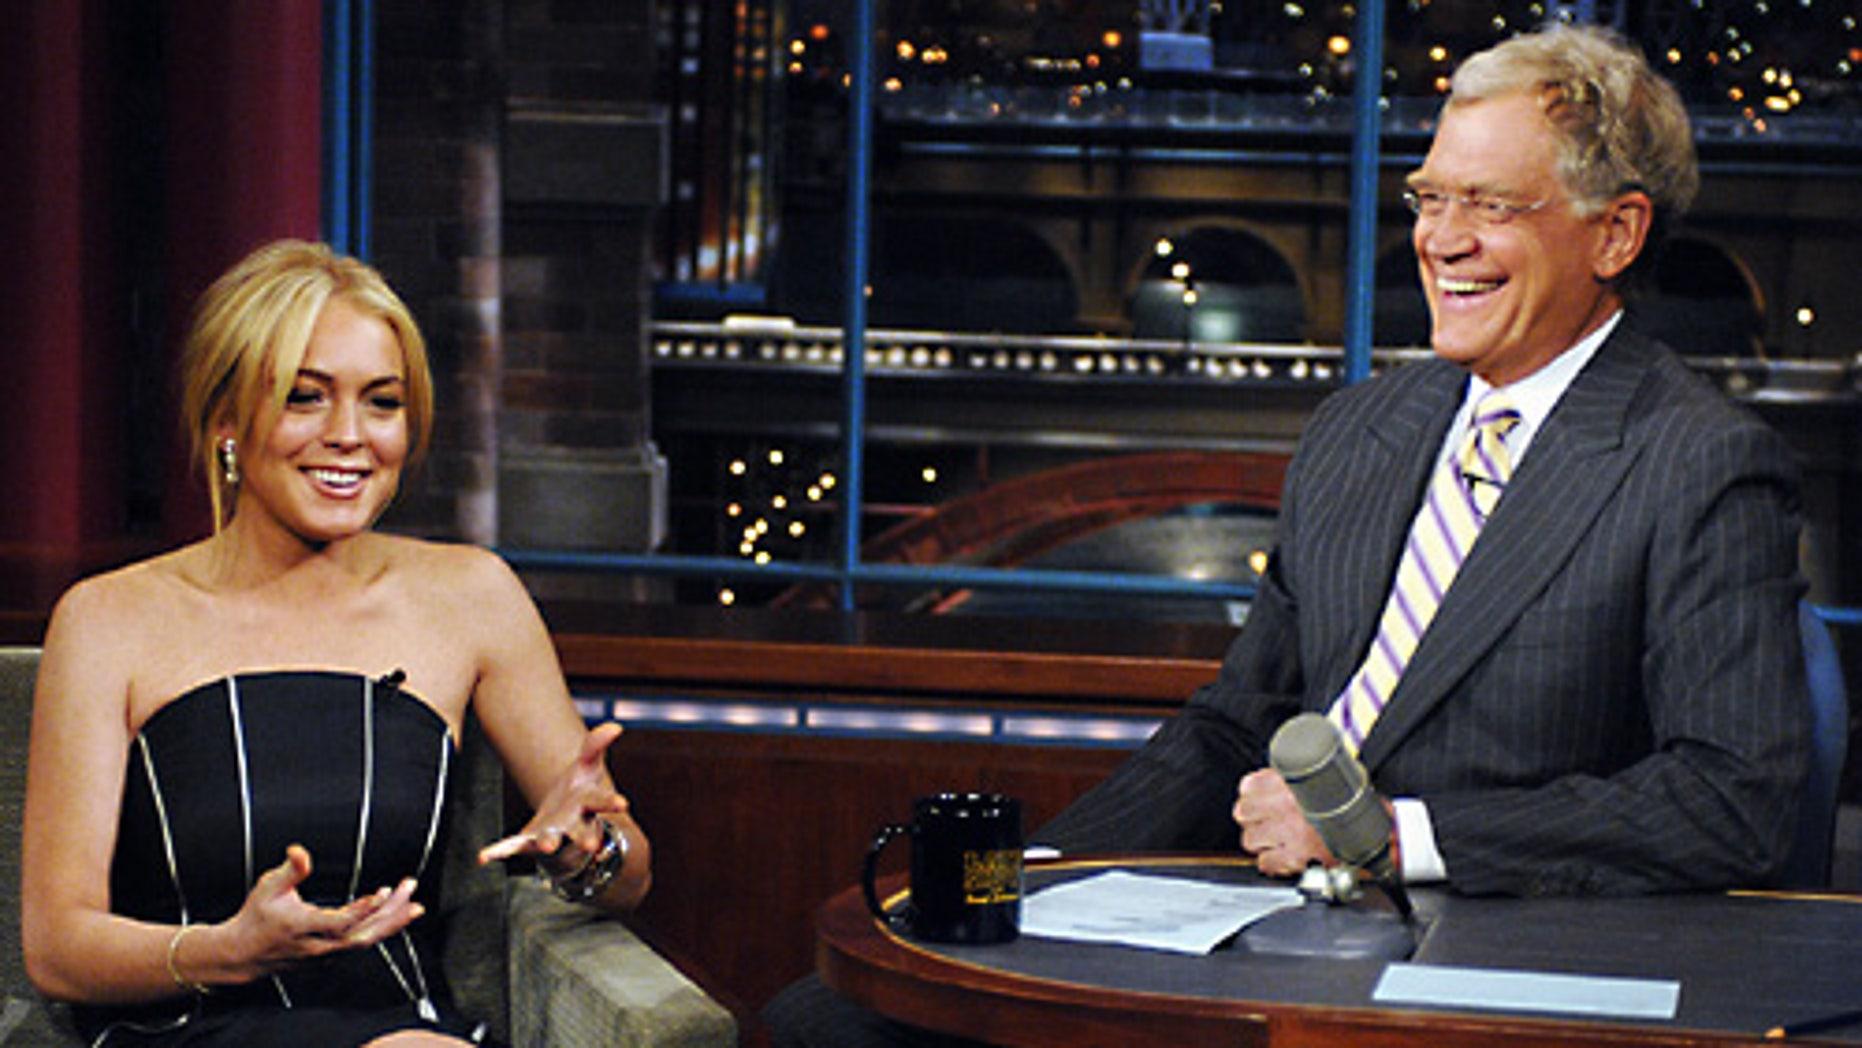 Lindsay Lohan on 'Late Night' in 2007. (CBS)